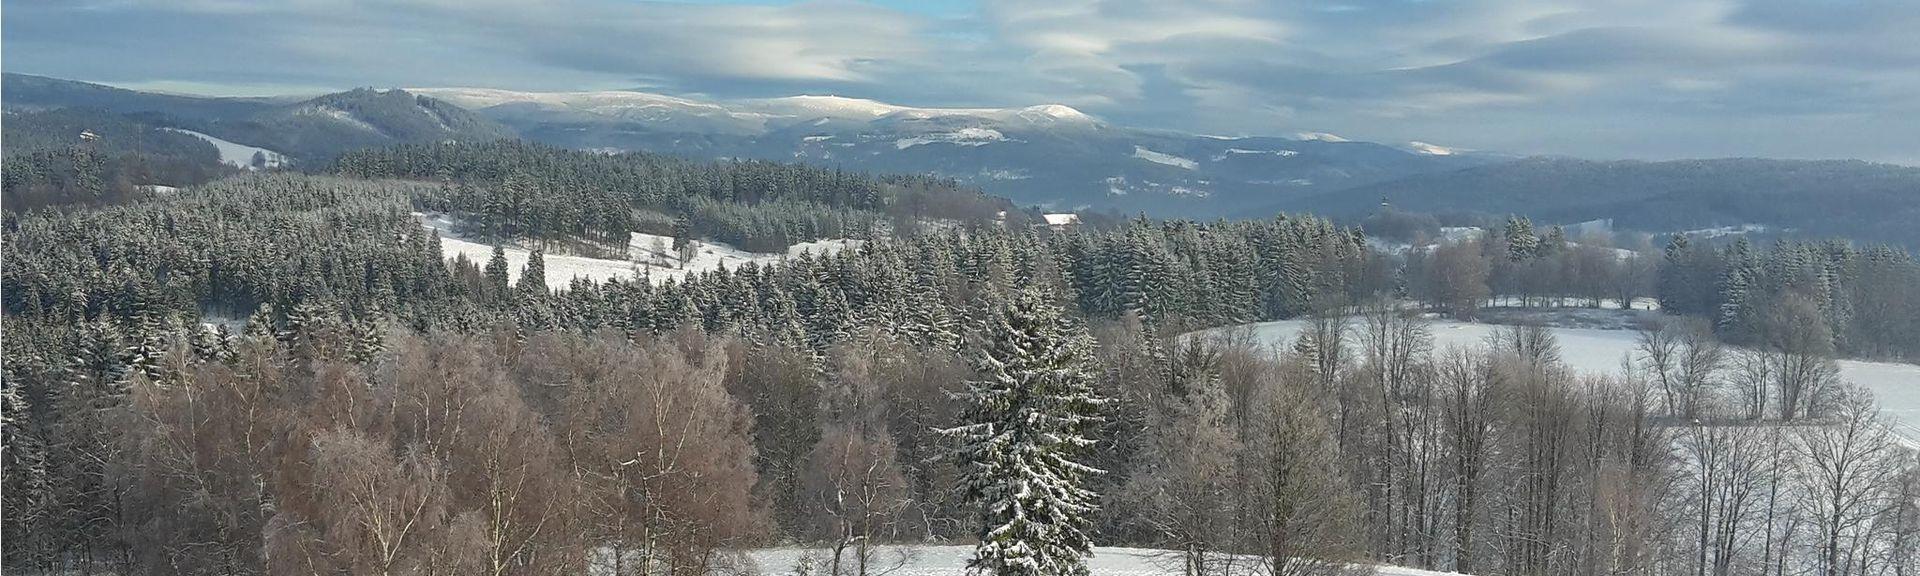 Harrachov, Liberec (regio), Tsjechië